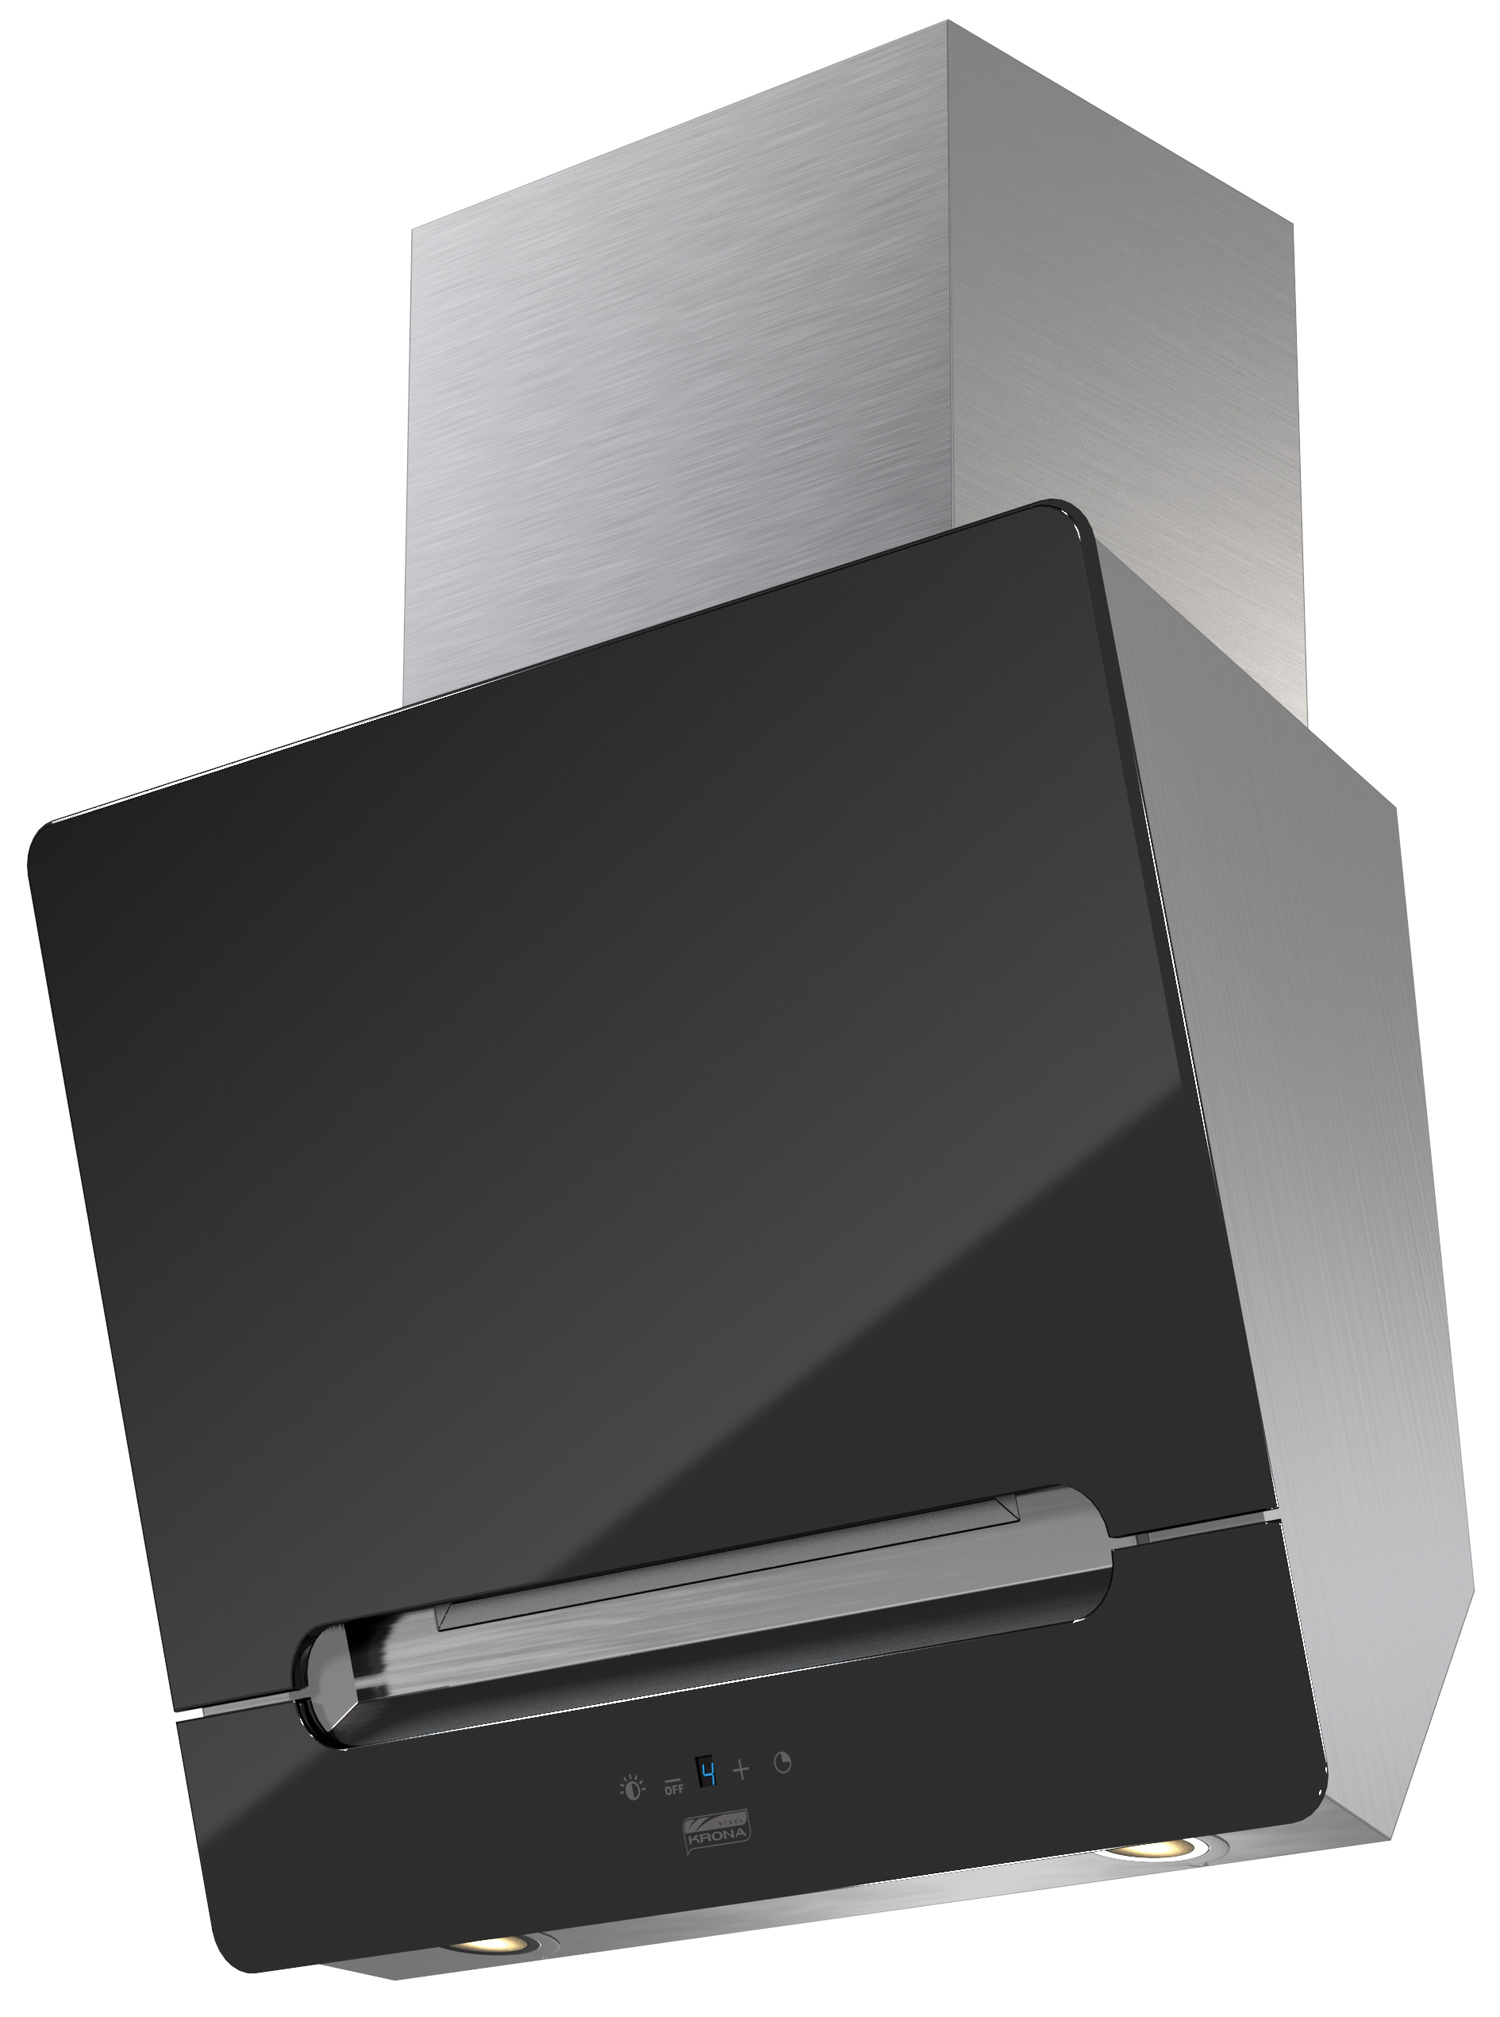 ruby_black_steel, стоимость 27 430 руб.